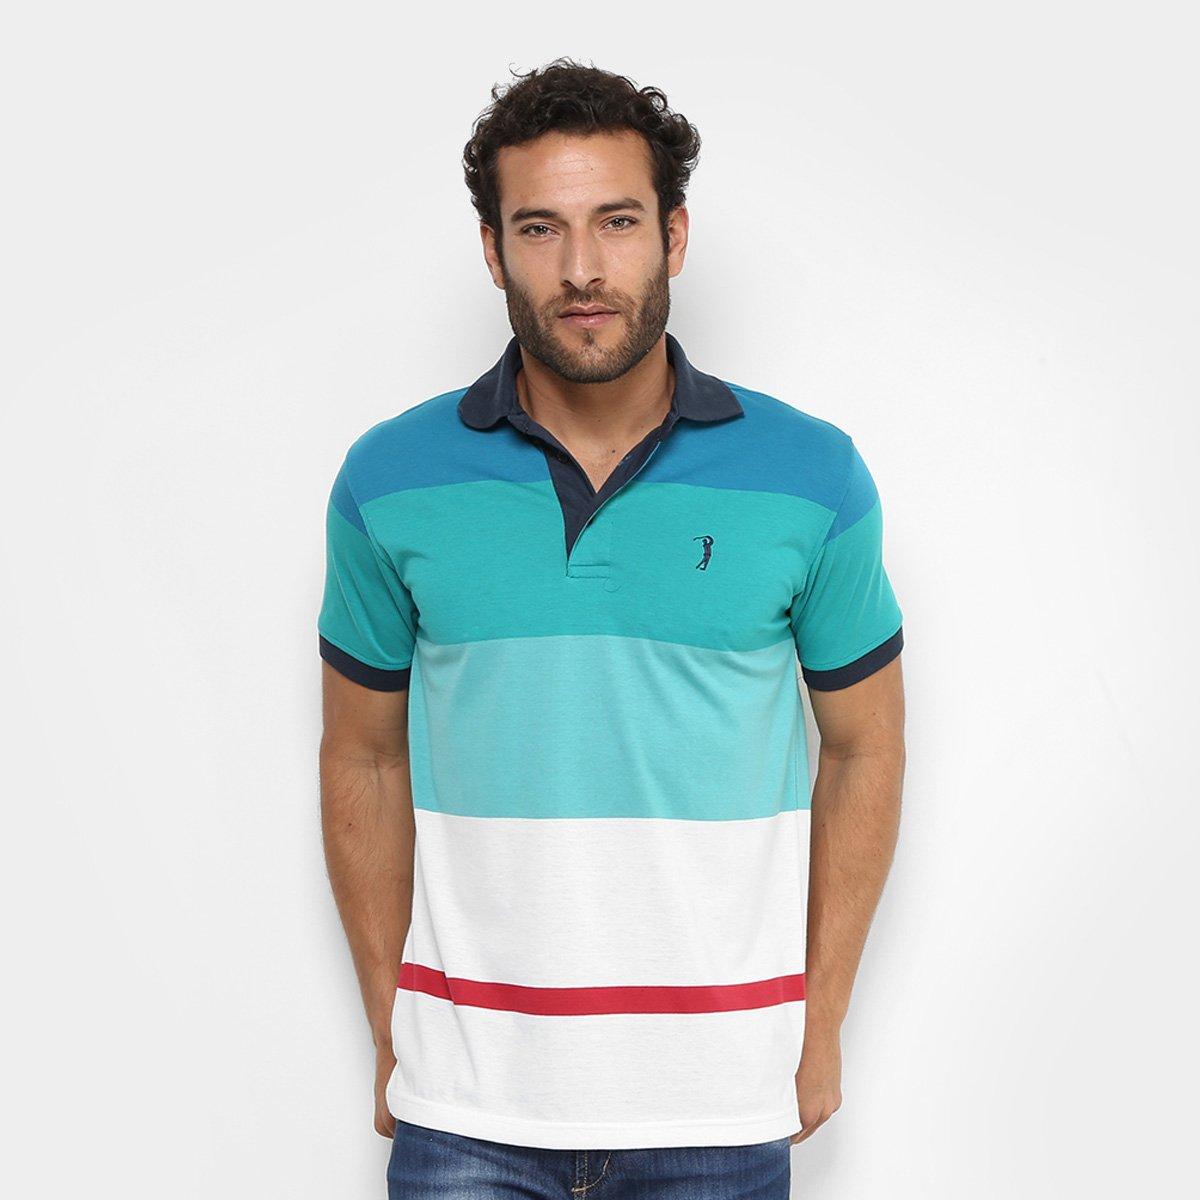 Camisa Polo Aleatory Listras Coloridas Masculina - Compre Agora ... 5d5ec640f3769